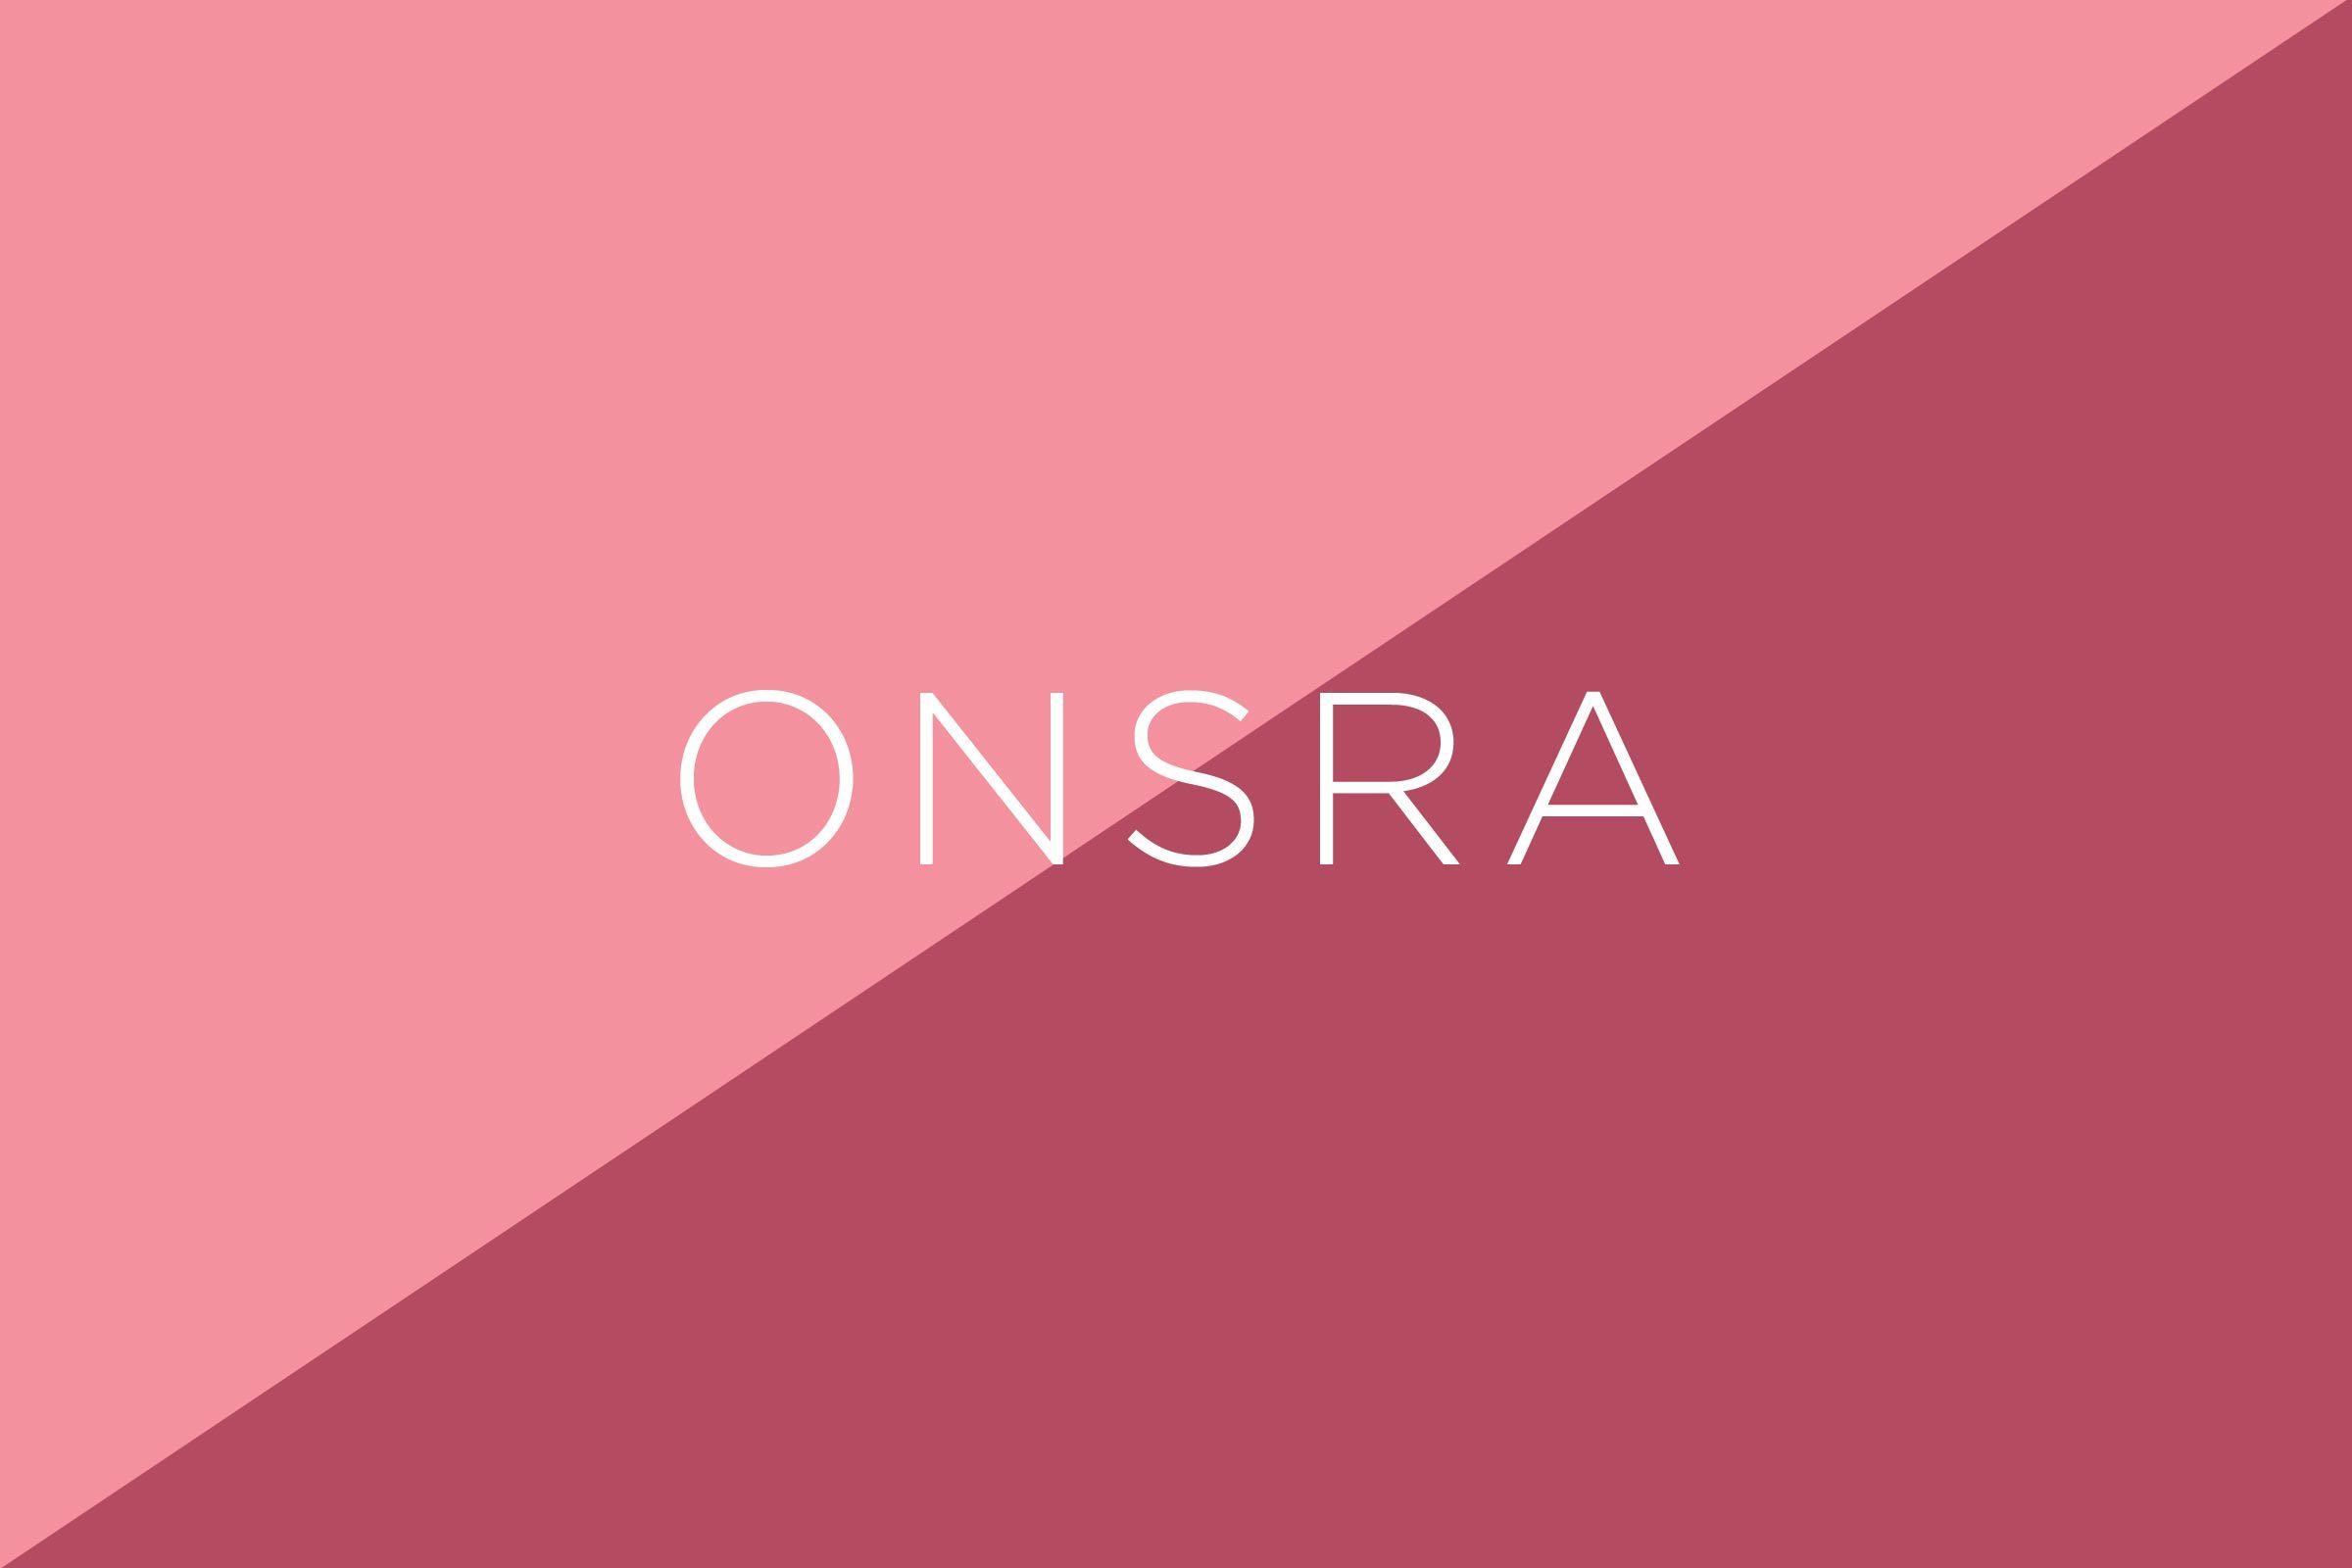 Onsra